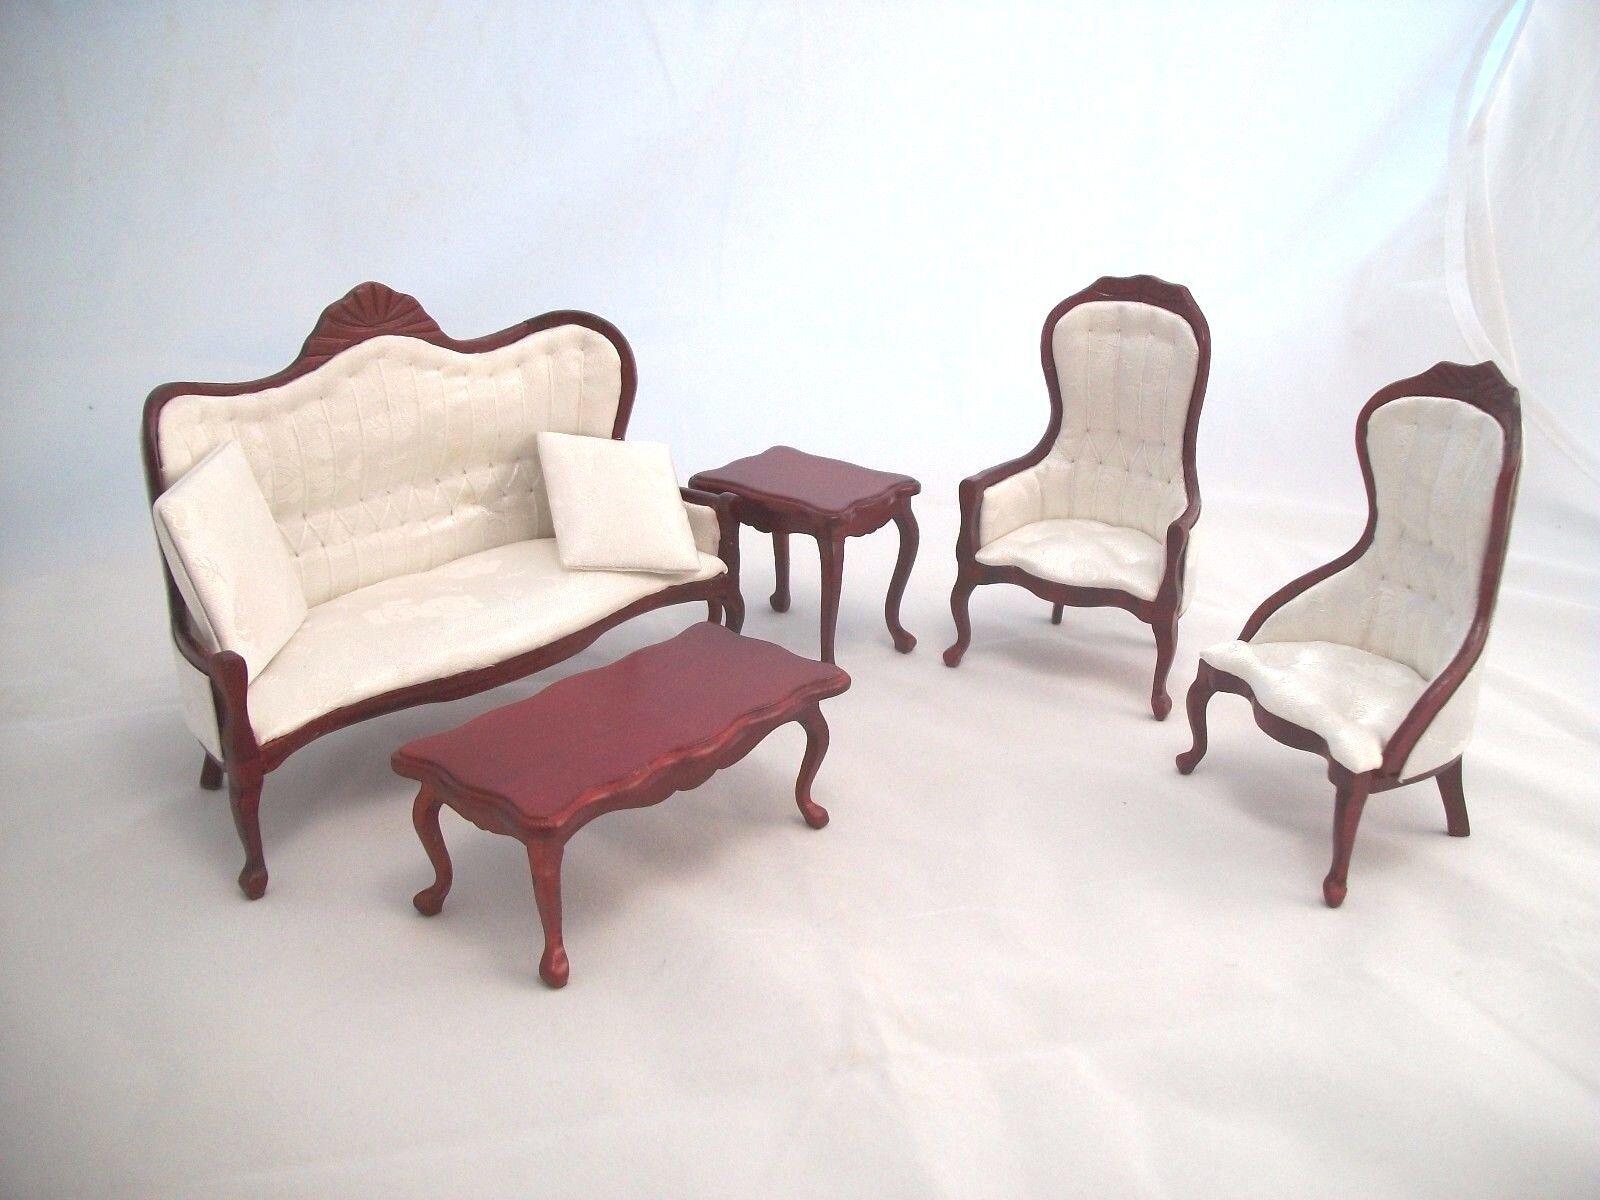 Victorian Living Room Parlor Set Mahogany Finish Dollhouse 1 12 Scale T0128 5pcs